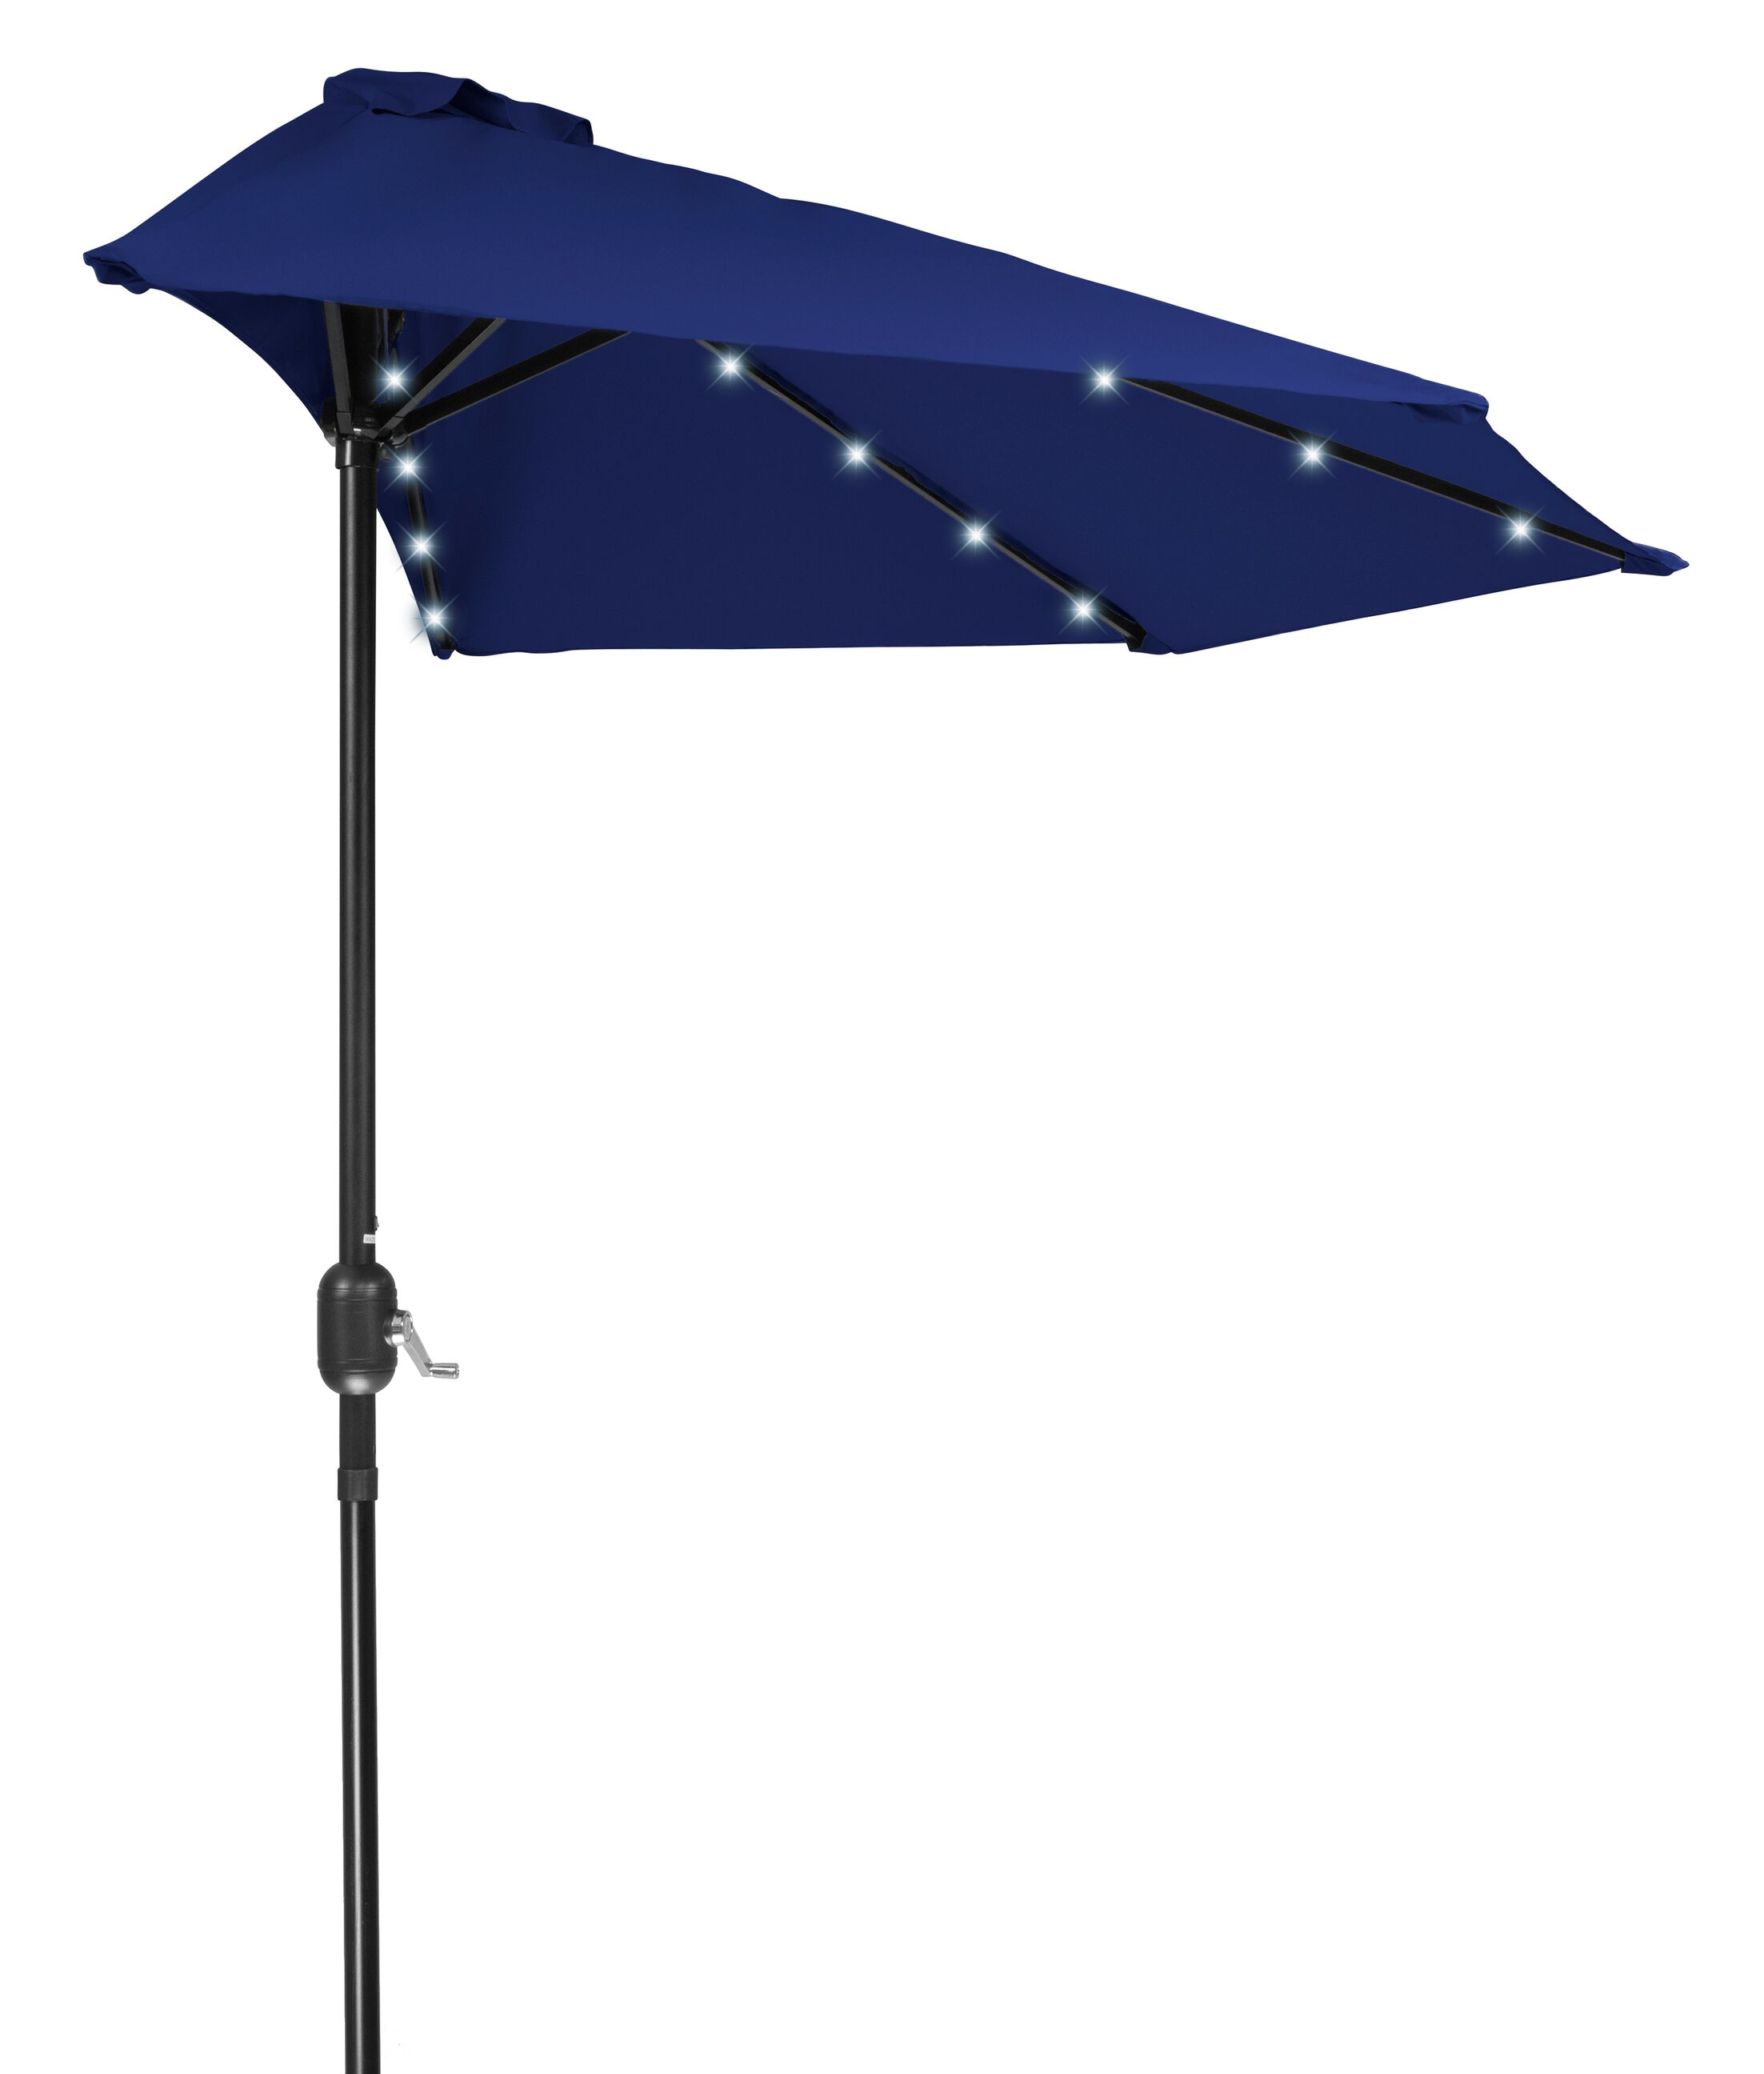 Phipps Patio Half LED Solar Powered 9' Lighted Umbrella